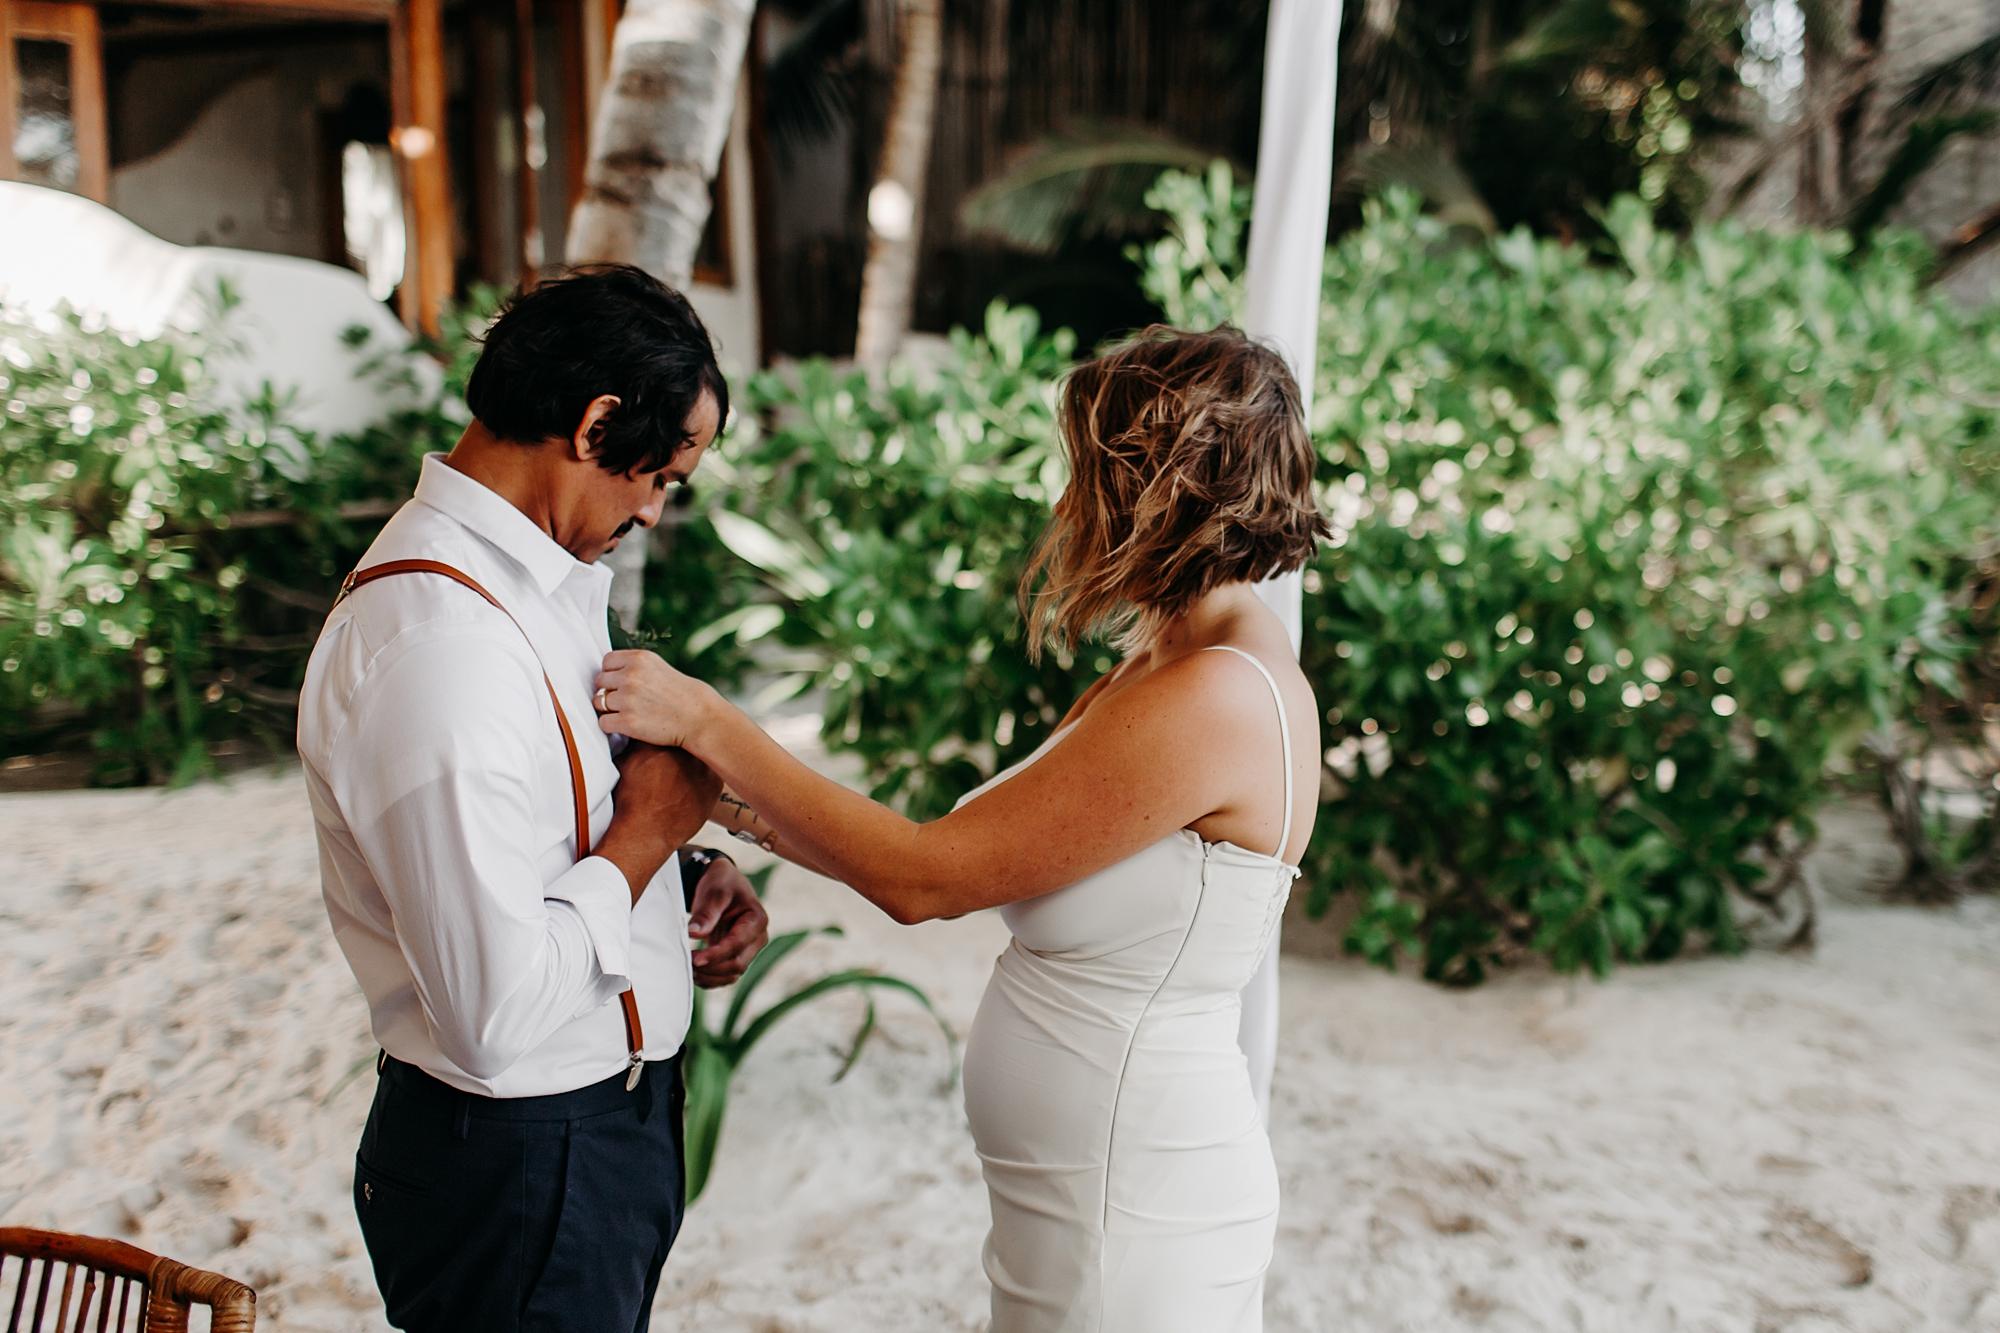 Danielle-San-Antonio-Wedding-Photographer-93_WEB.jpg